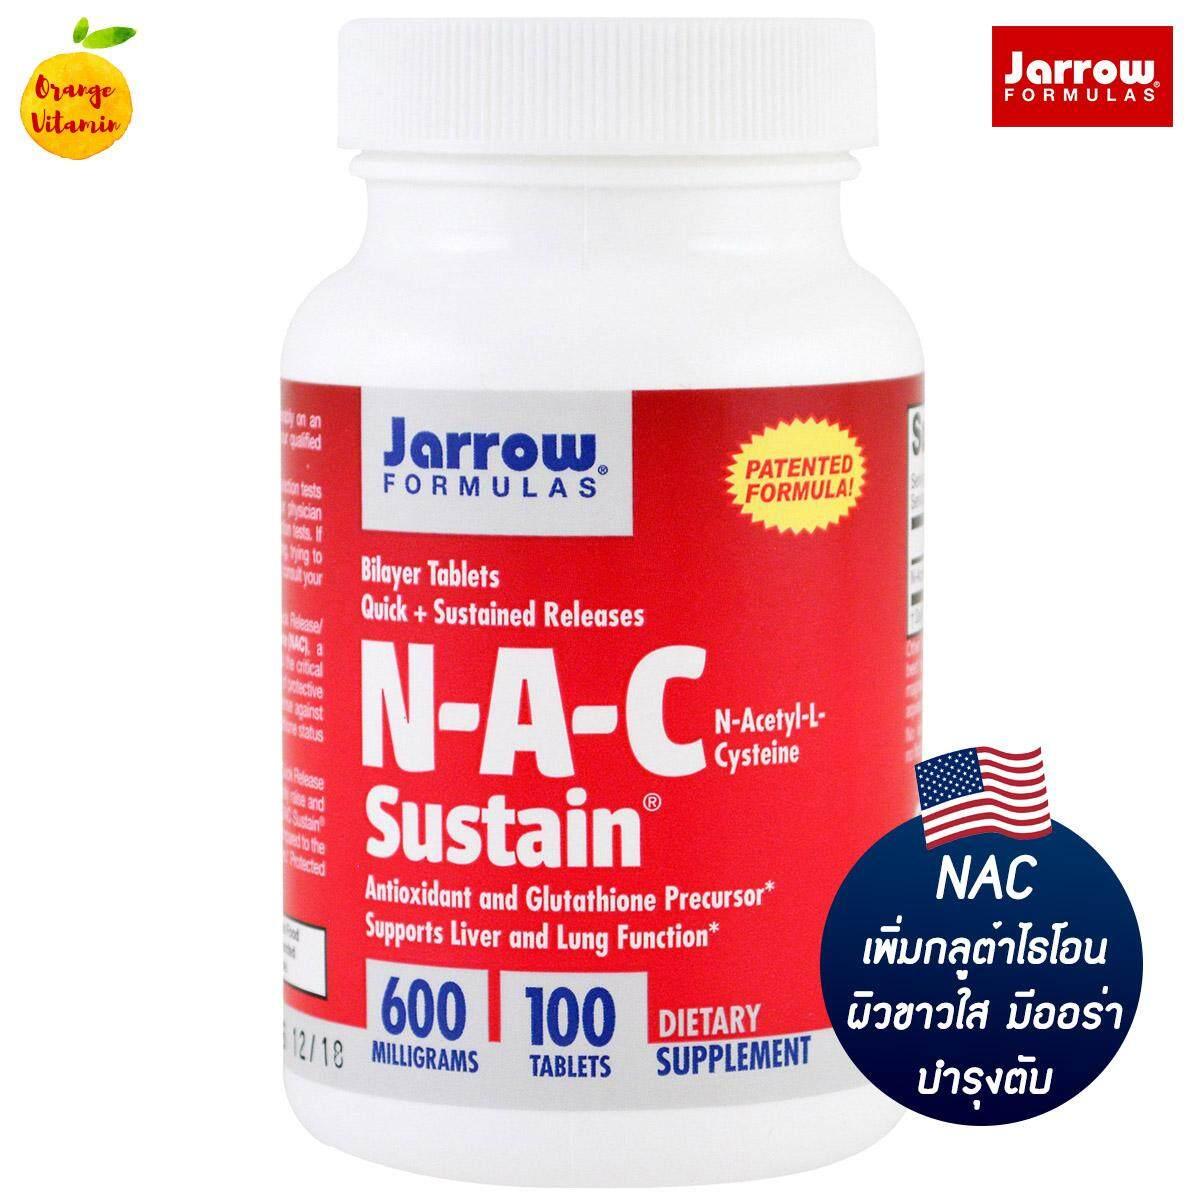 Jarrow Formulas, N-A-C Sustain, N-Acetyl-L-Cysteine, 600 mg, 100 Tablets NAC อะเซทิลซิสเทอีน ผิวขาว กระจ่างใส มีออร่า กลูต้าผิวขาว เพิ่มกลูต้าไธโอน glutathione บำรุงตับ